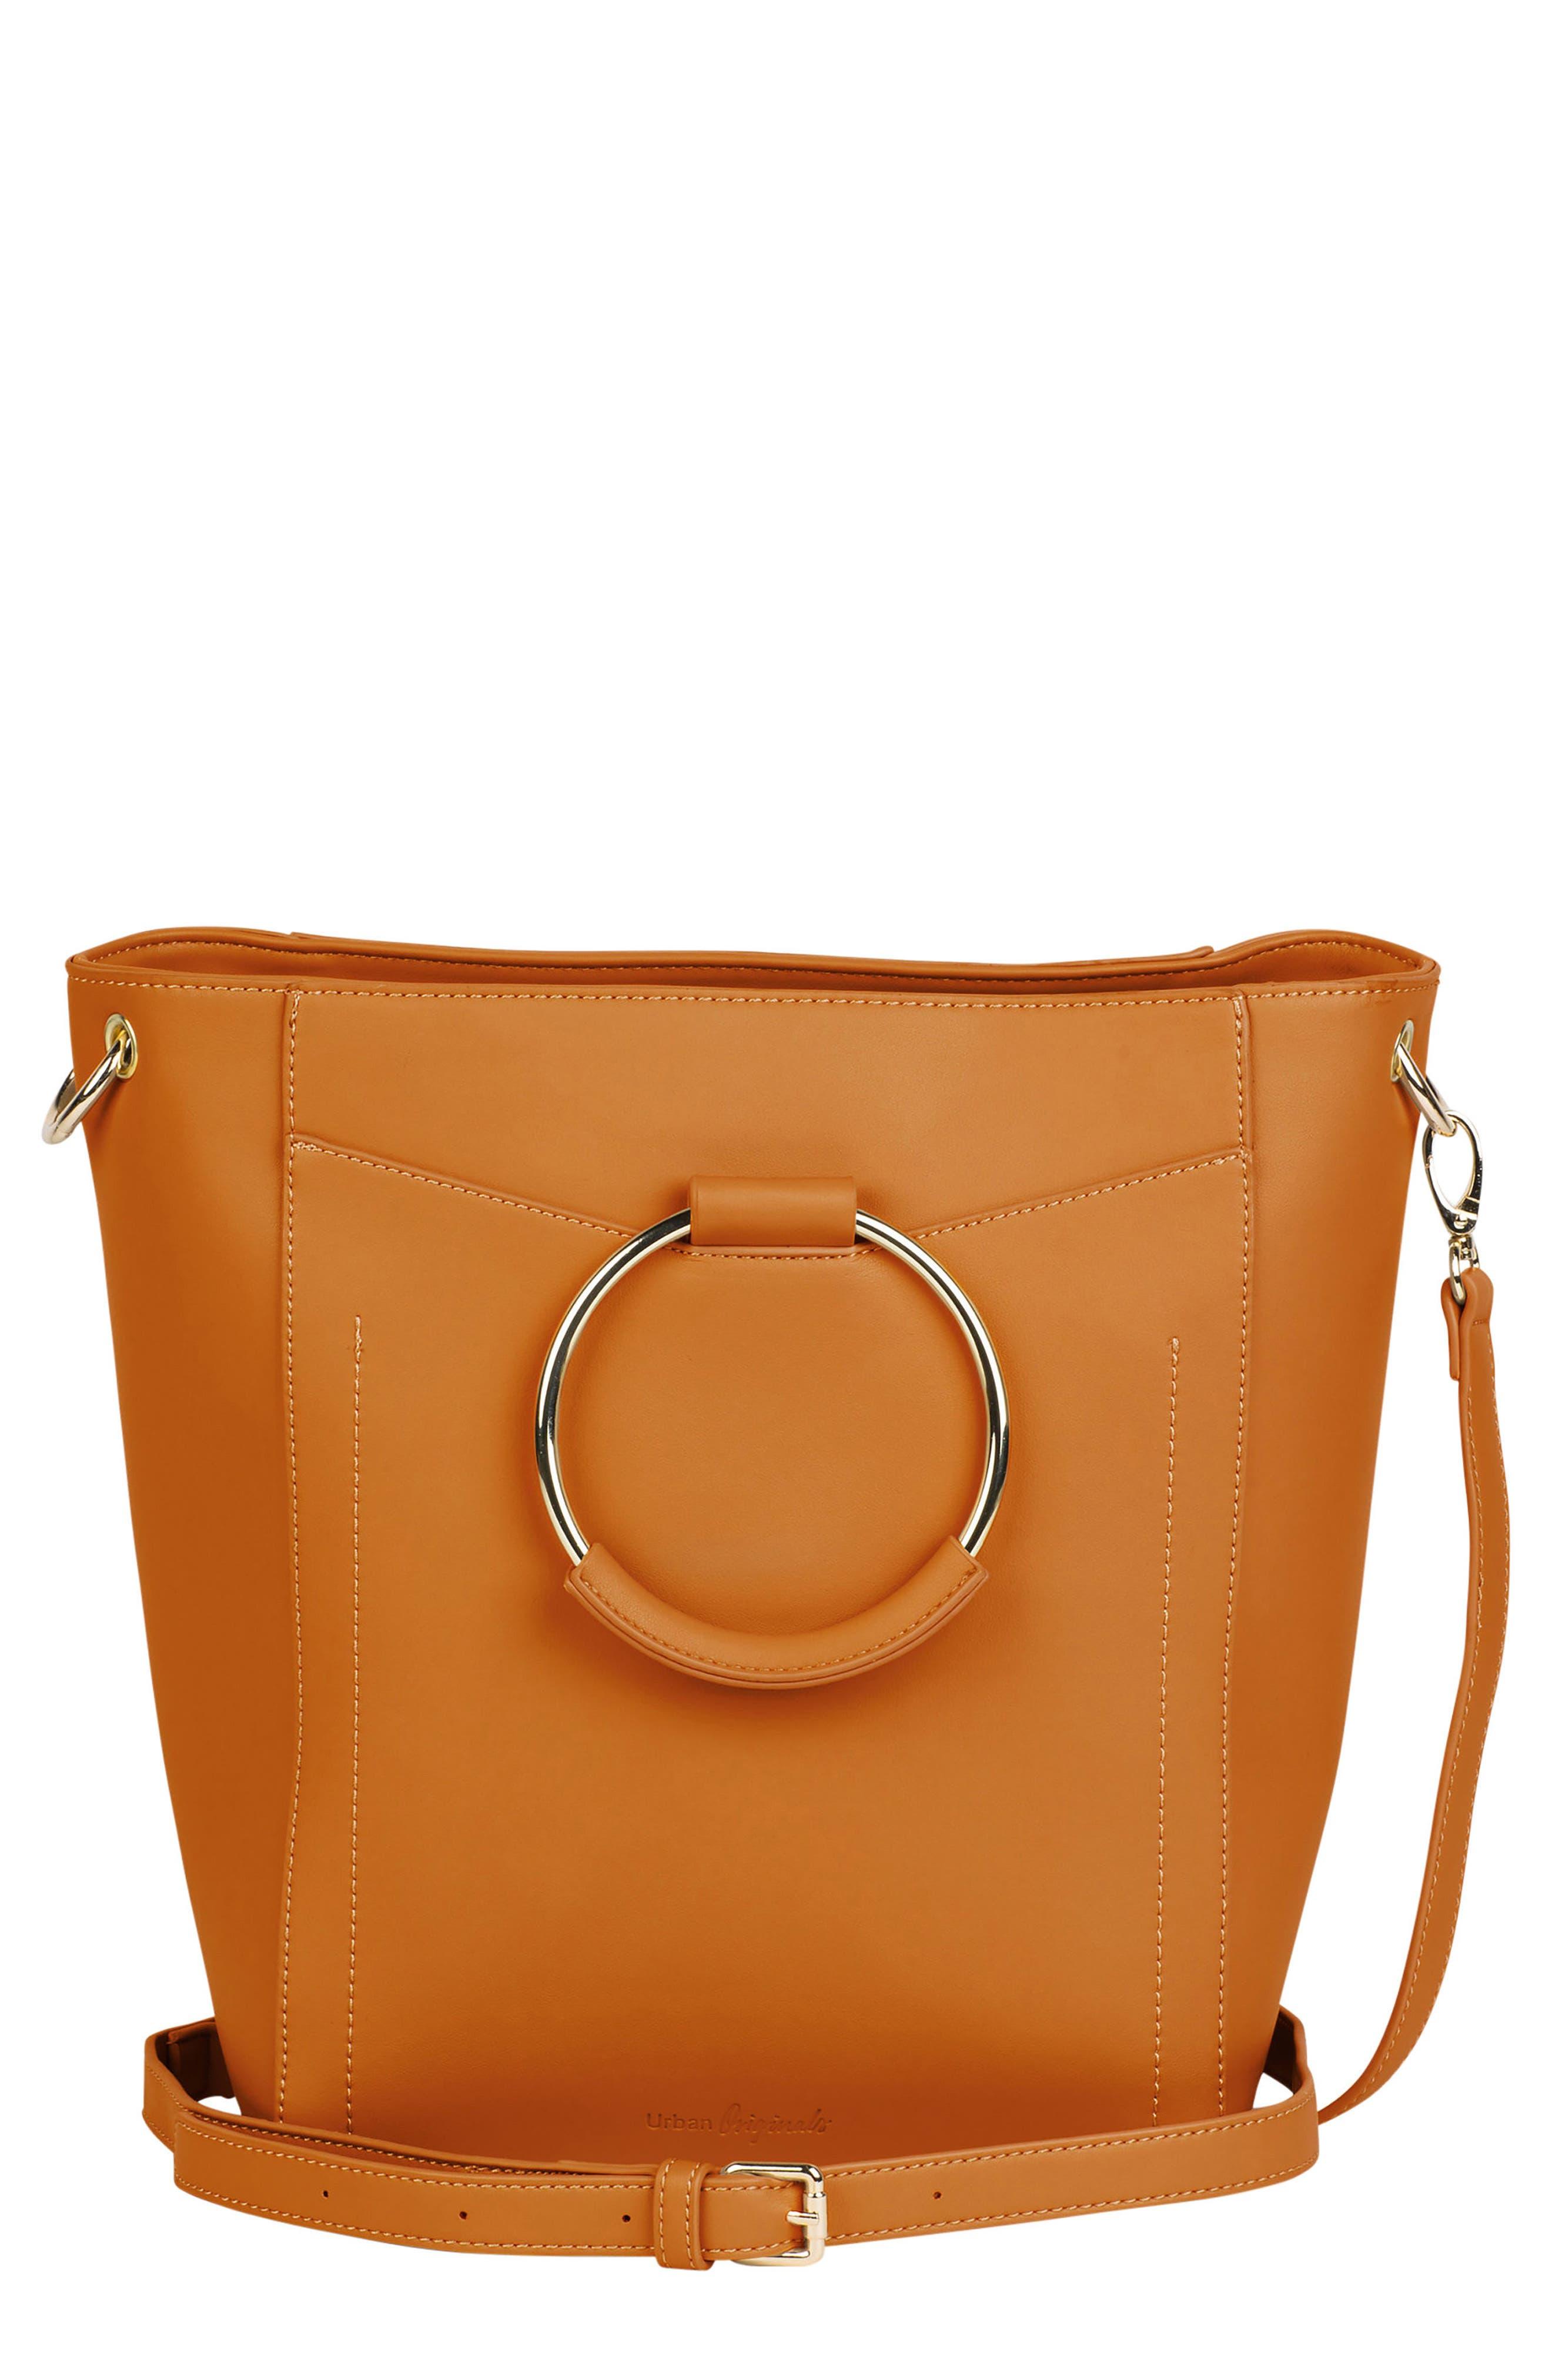 Luminescent Vegan Leather Crossbody Bag,                         Main,                         color, Tan